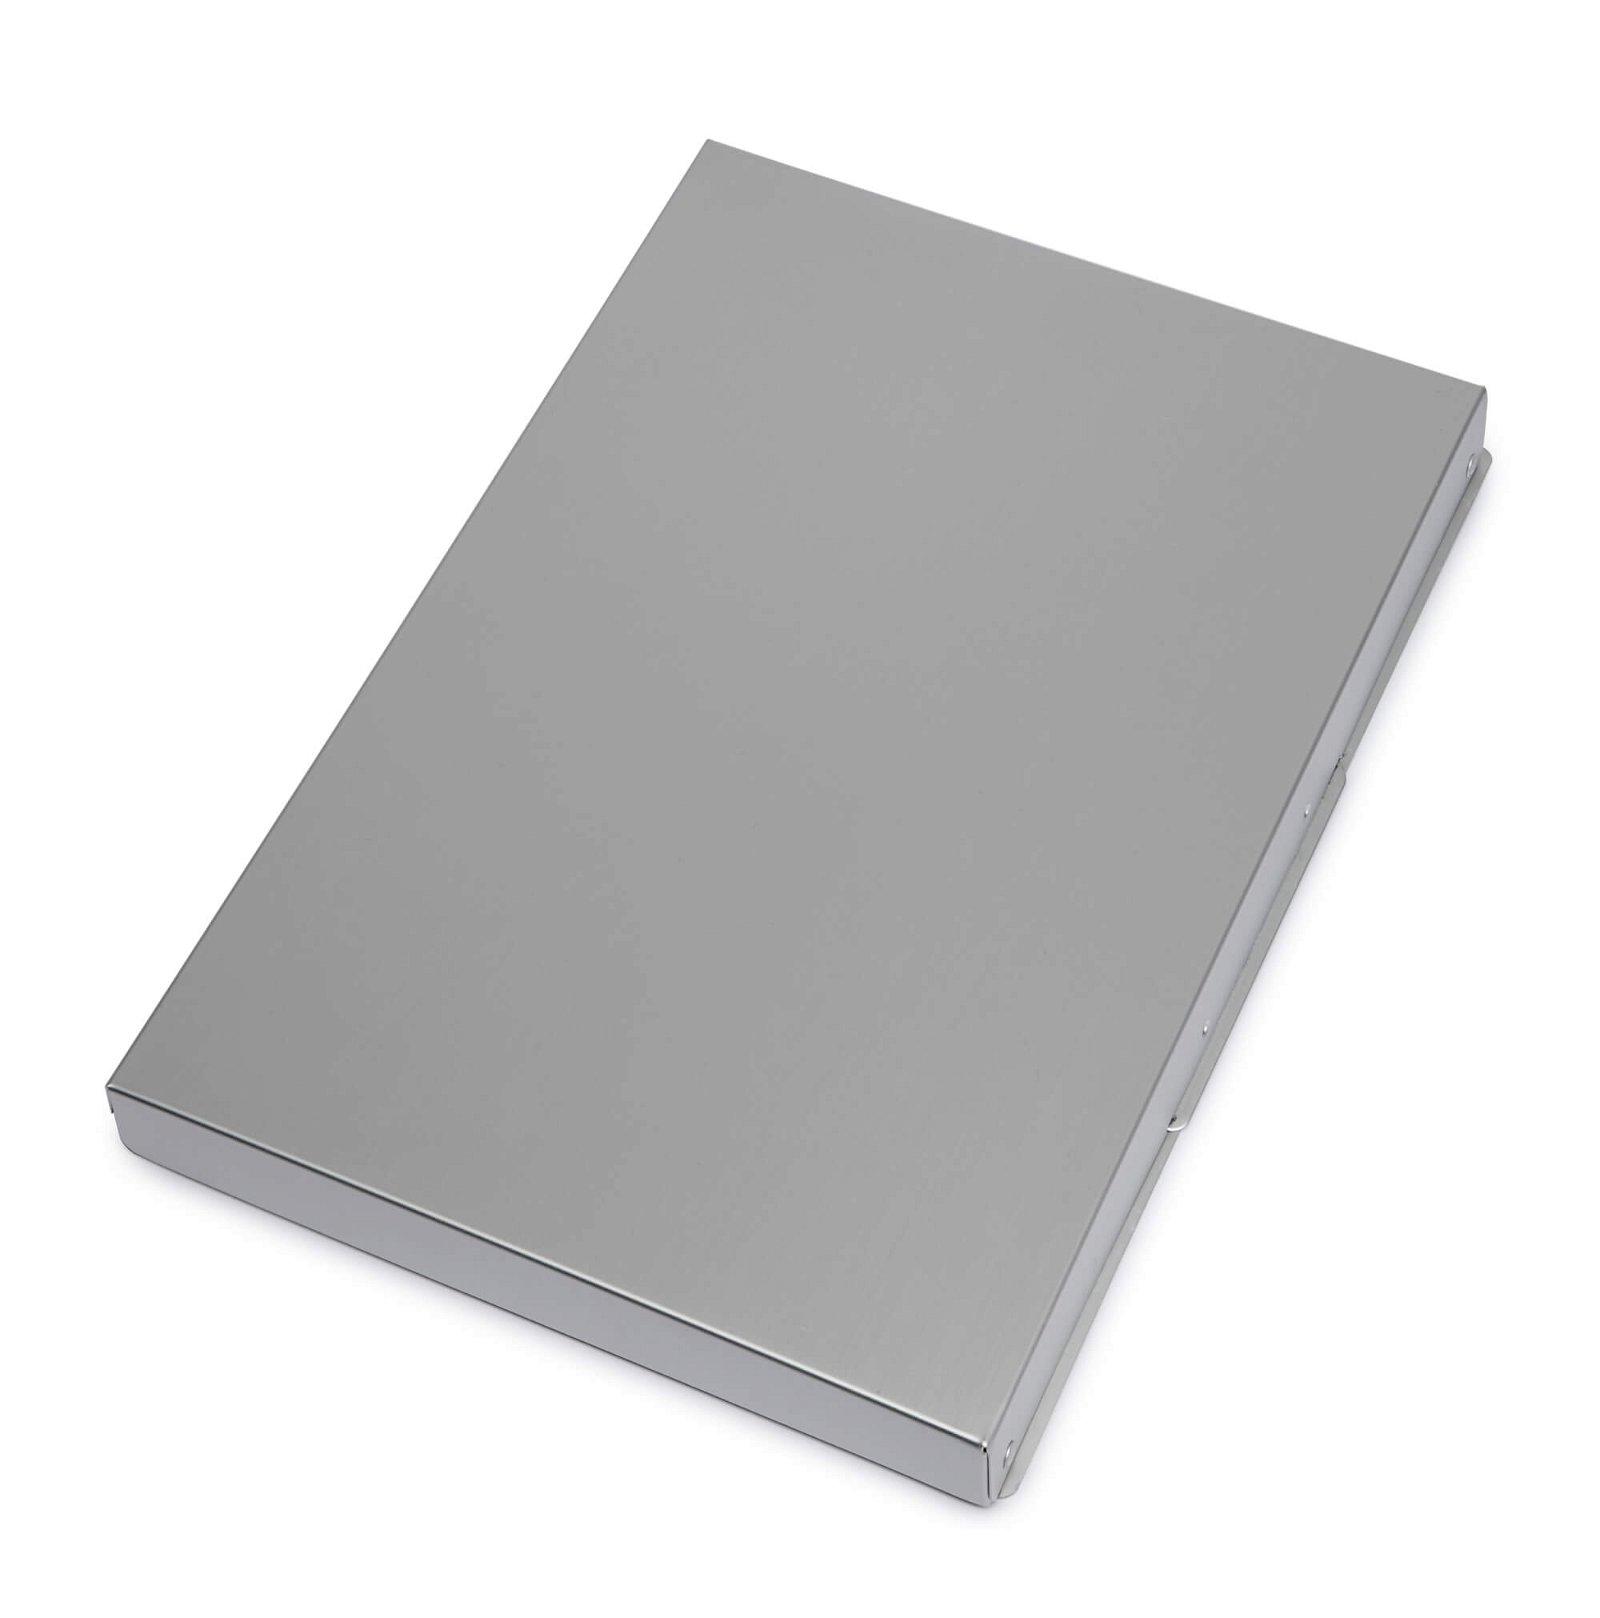 A4 Schreibplatte MAULassist